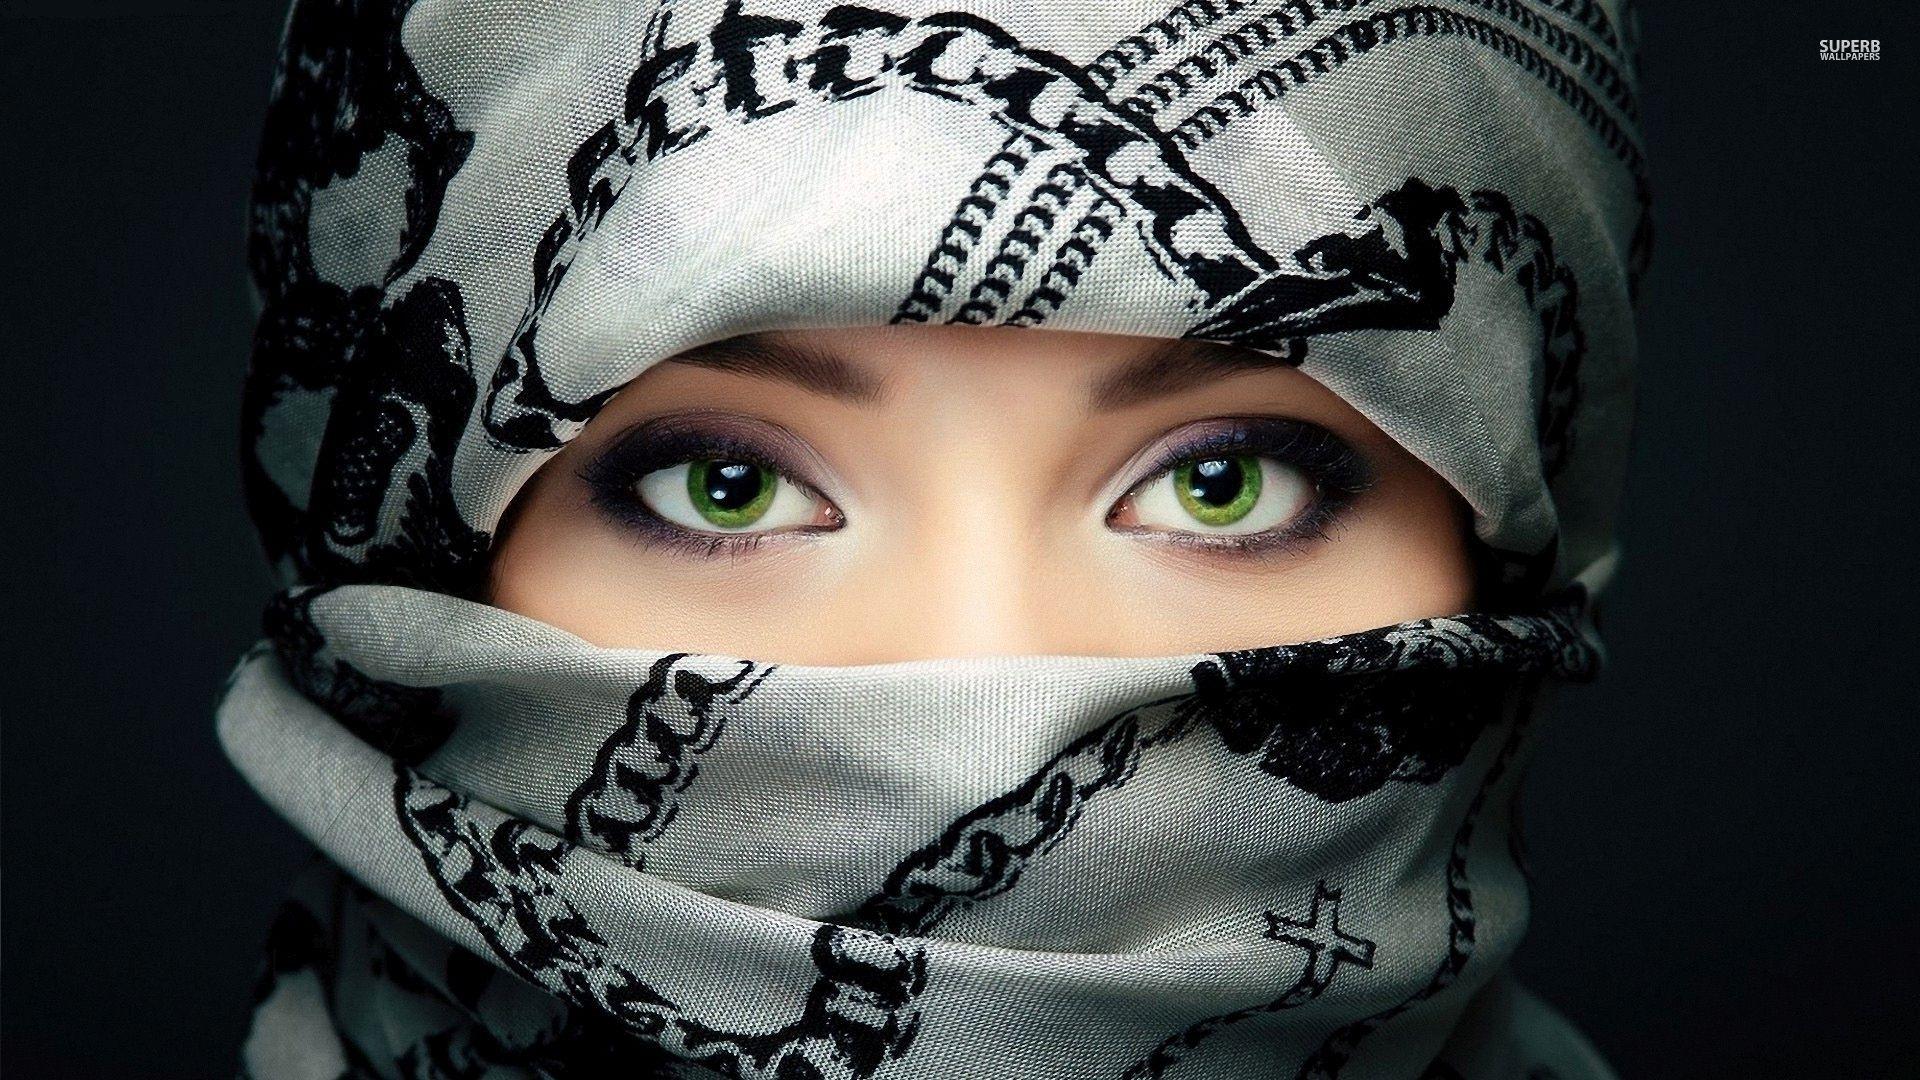 Image For Amazing Green Eyes Of An Arabian Girl Wallpaper